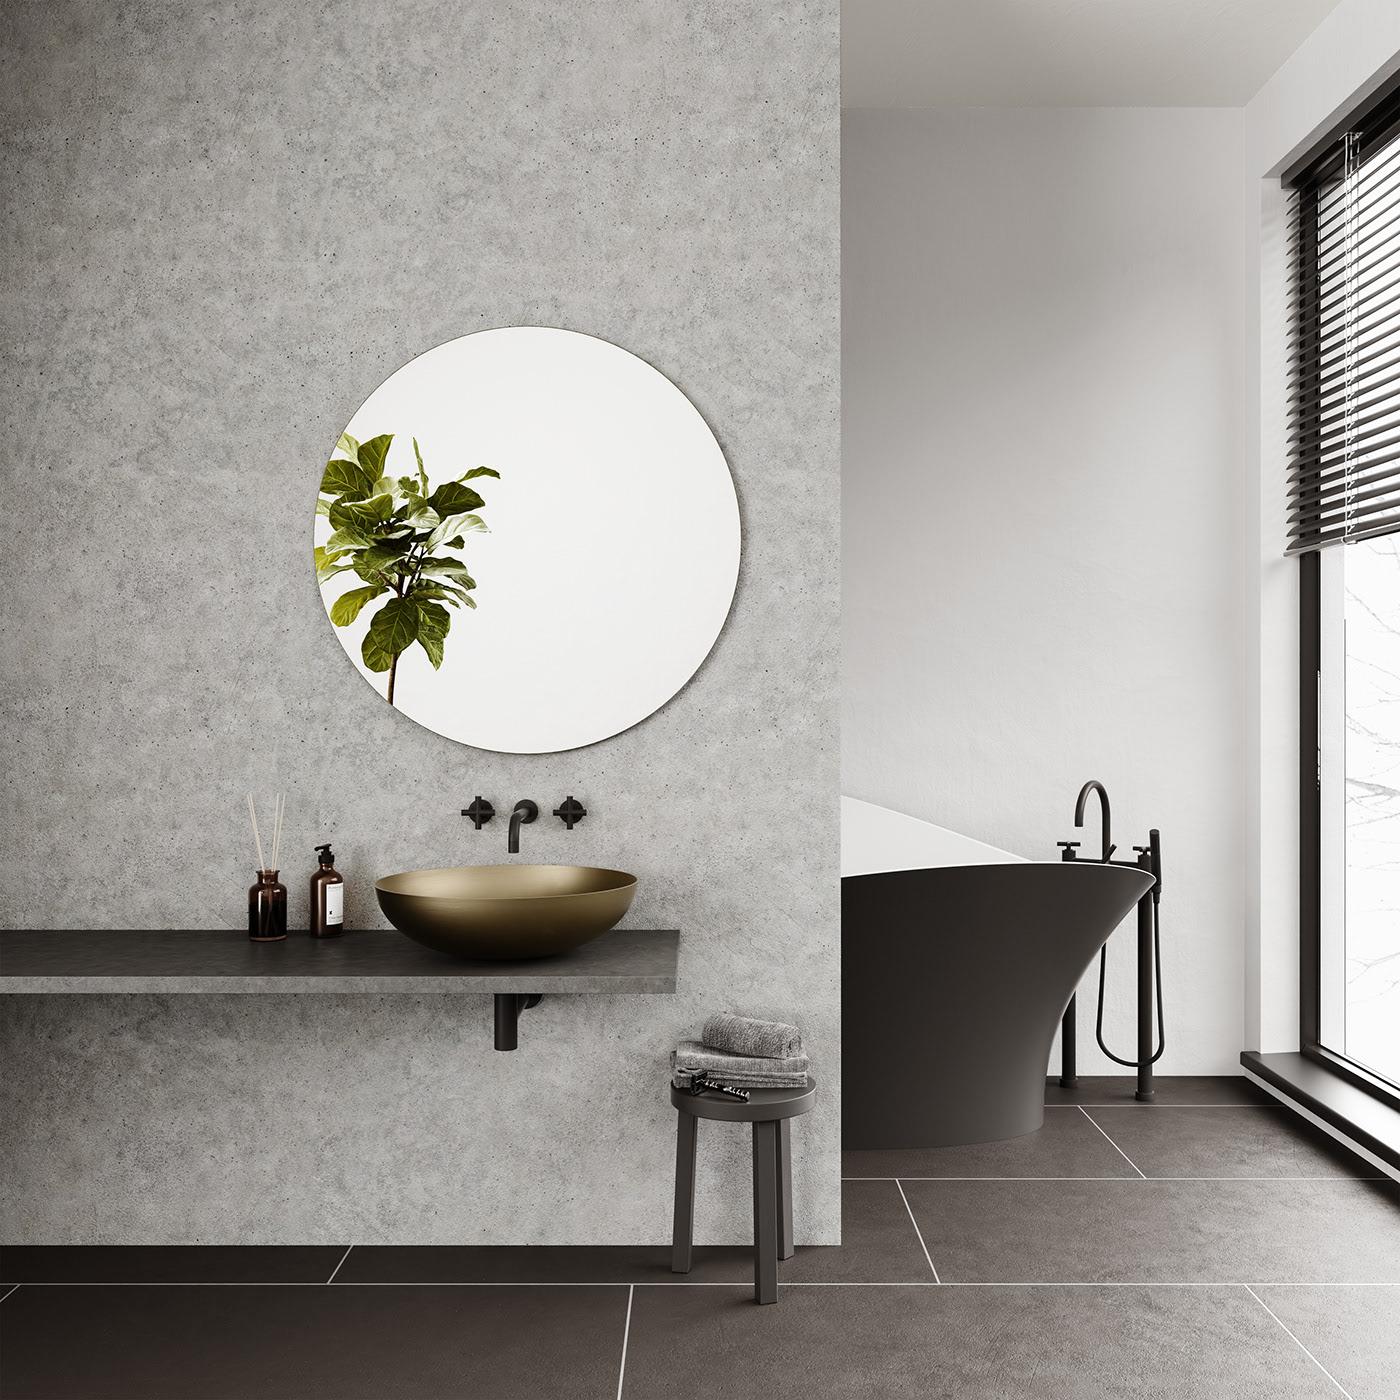 5 Ways To Style Round Mirrors At Home Interior Design I Magazine Uk Lifestyle Magazine